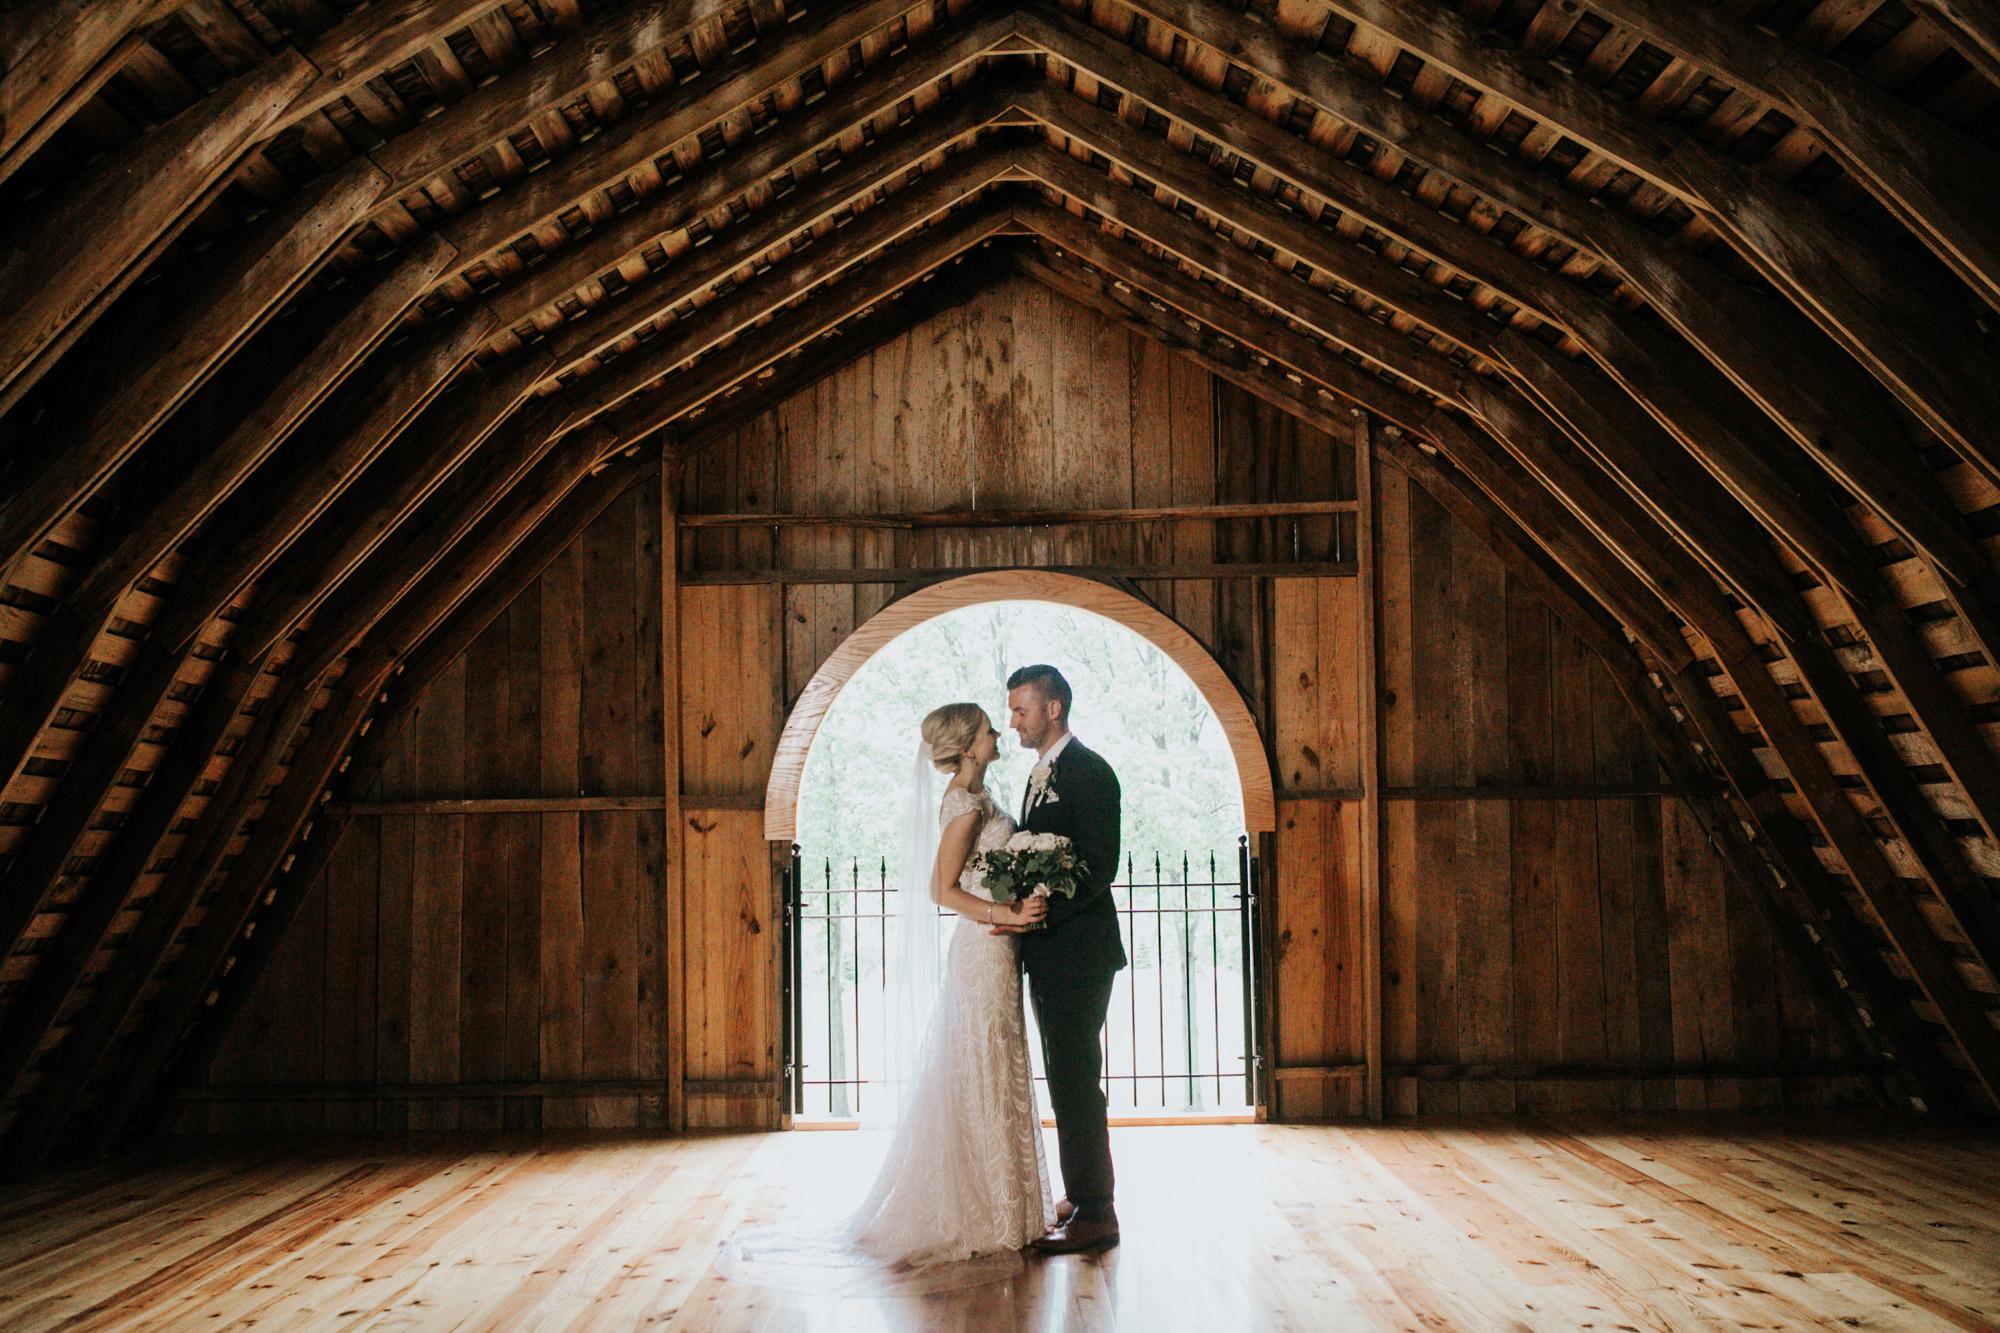 the-stables-weddings-17.jpg